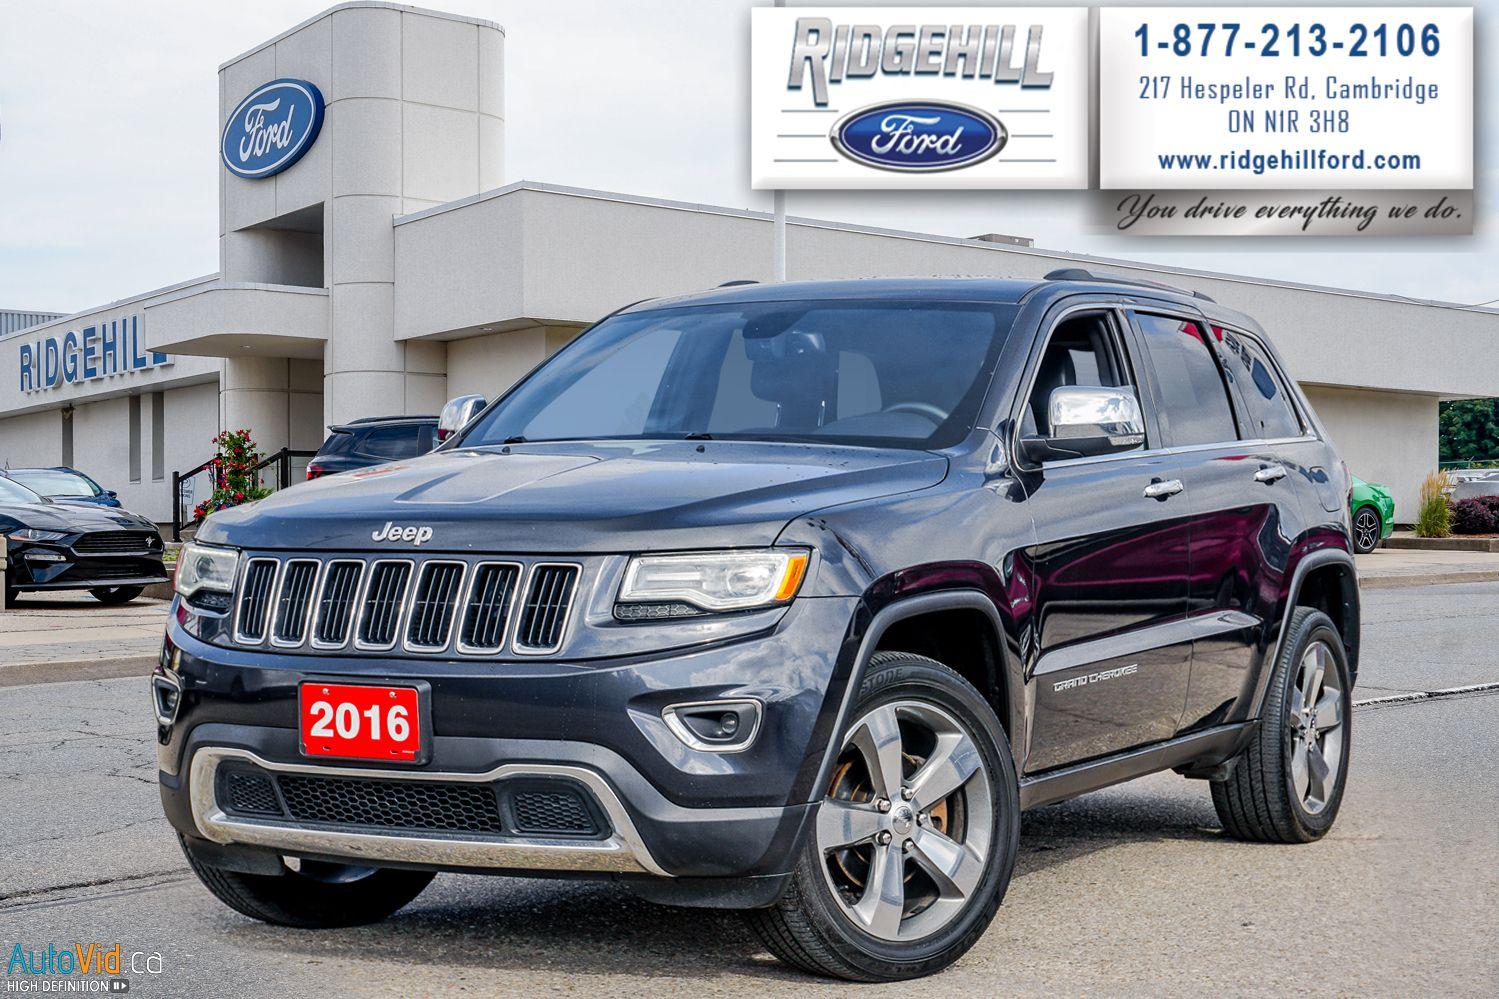 2016 Jeep Grand Cherokee Image